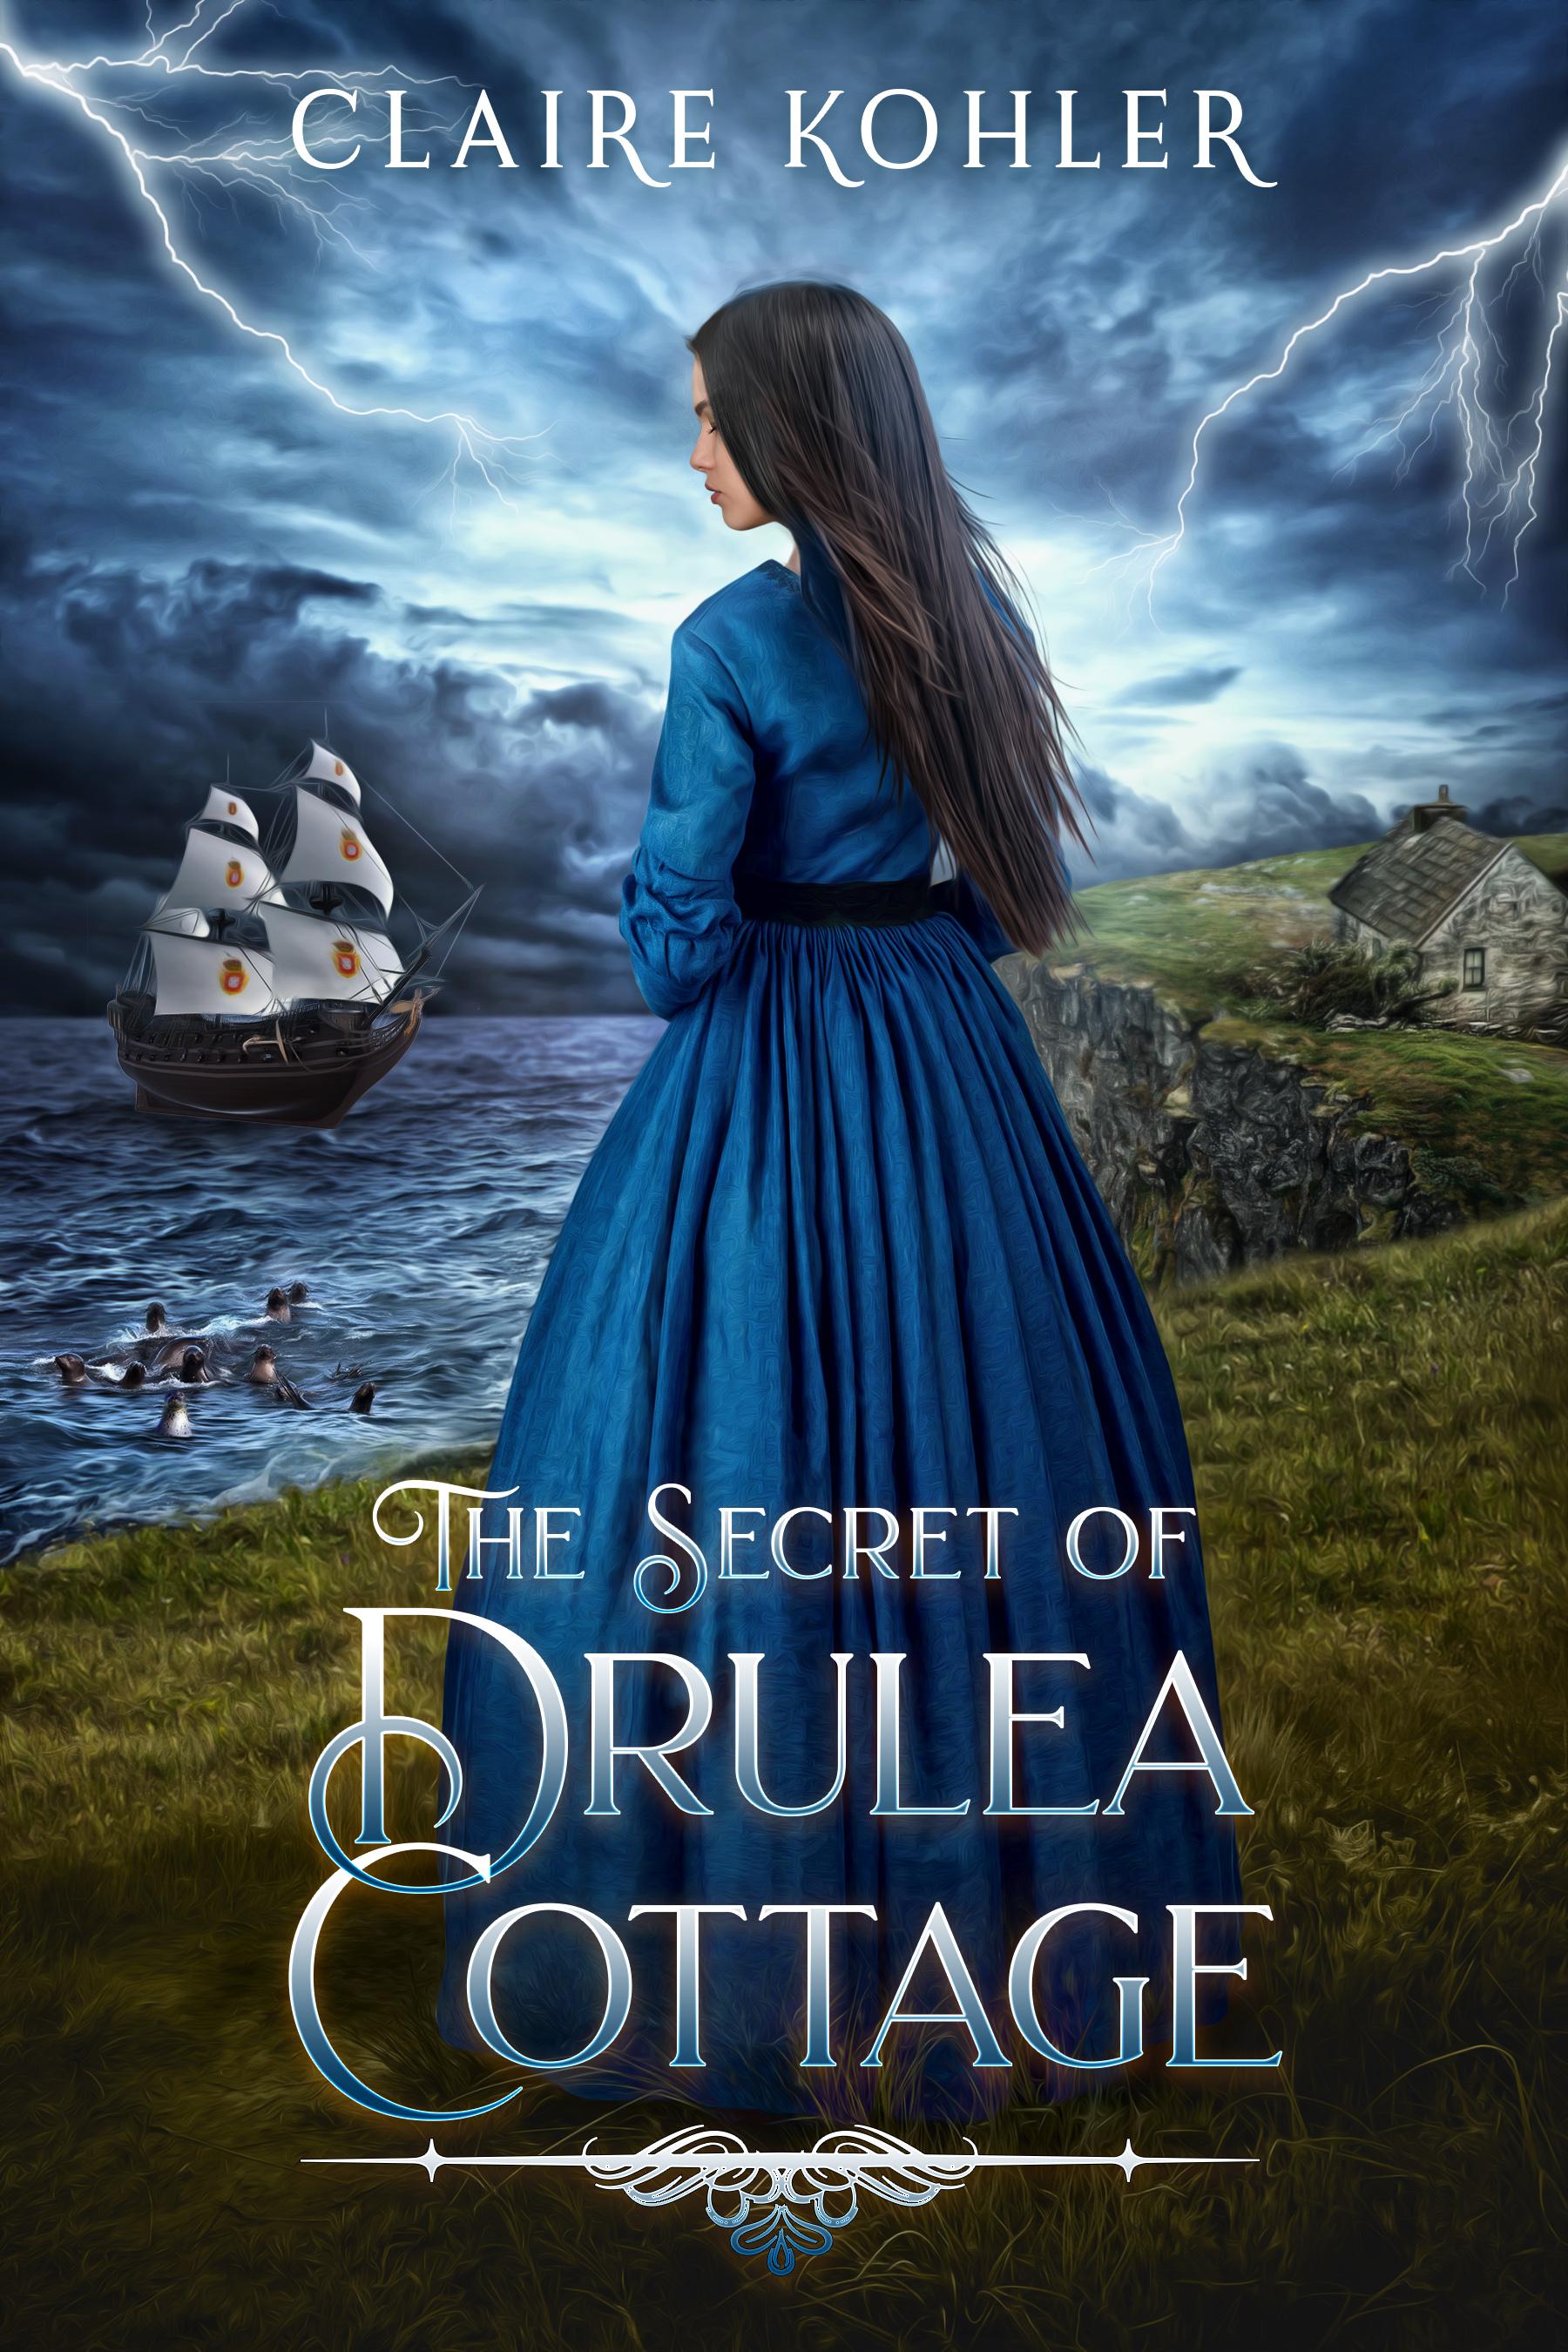 BookCover_The Secret of Drulea Cottage